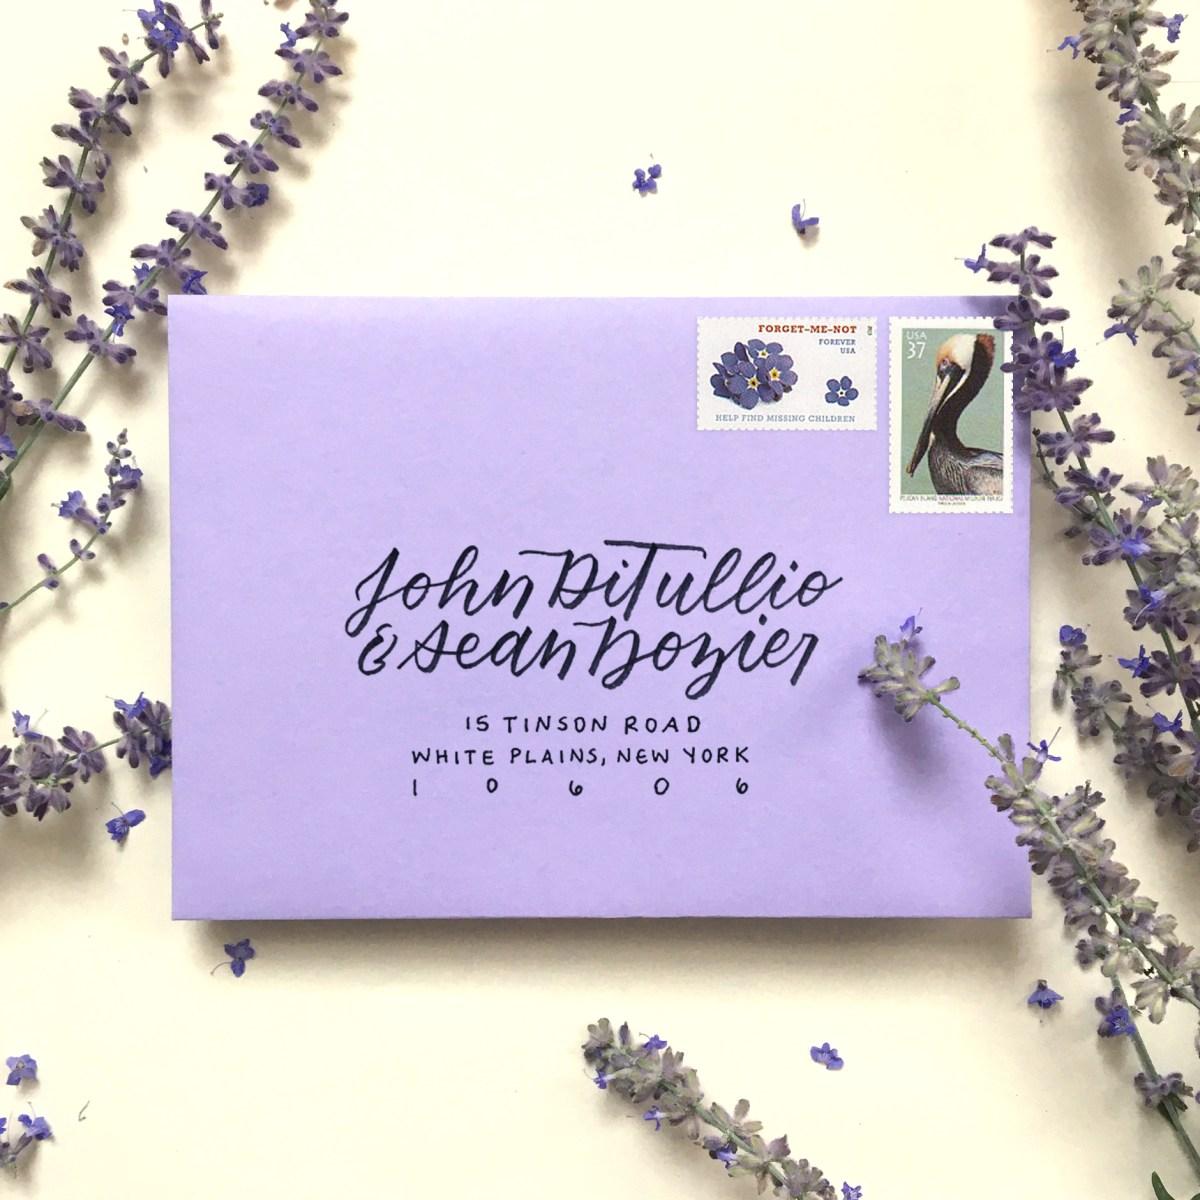 calligraphy envelope addressing sample